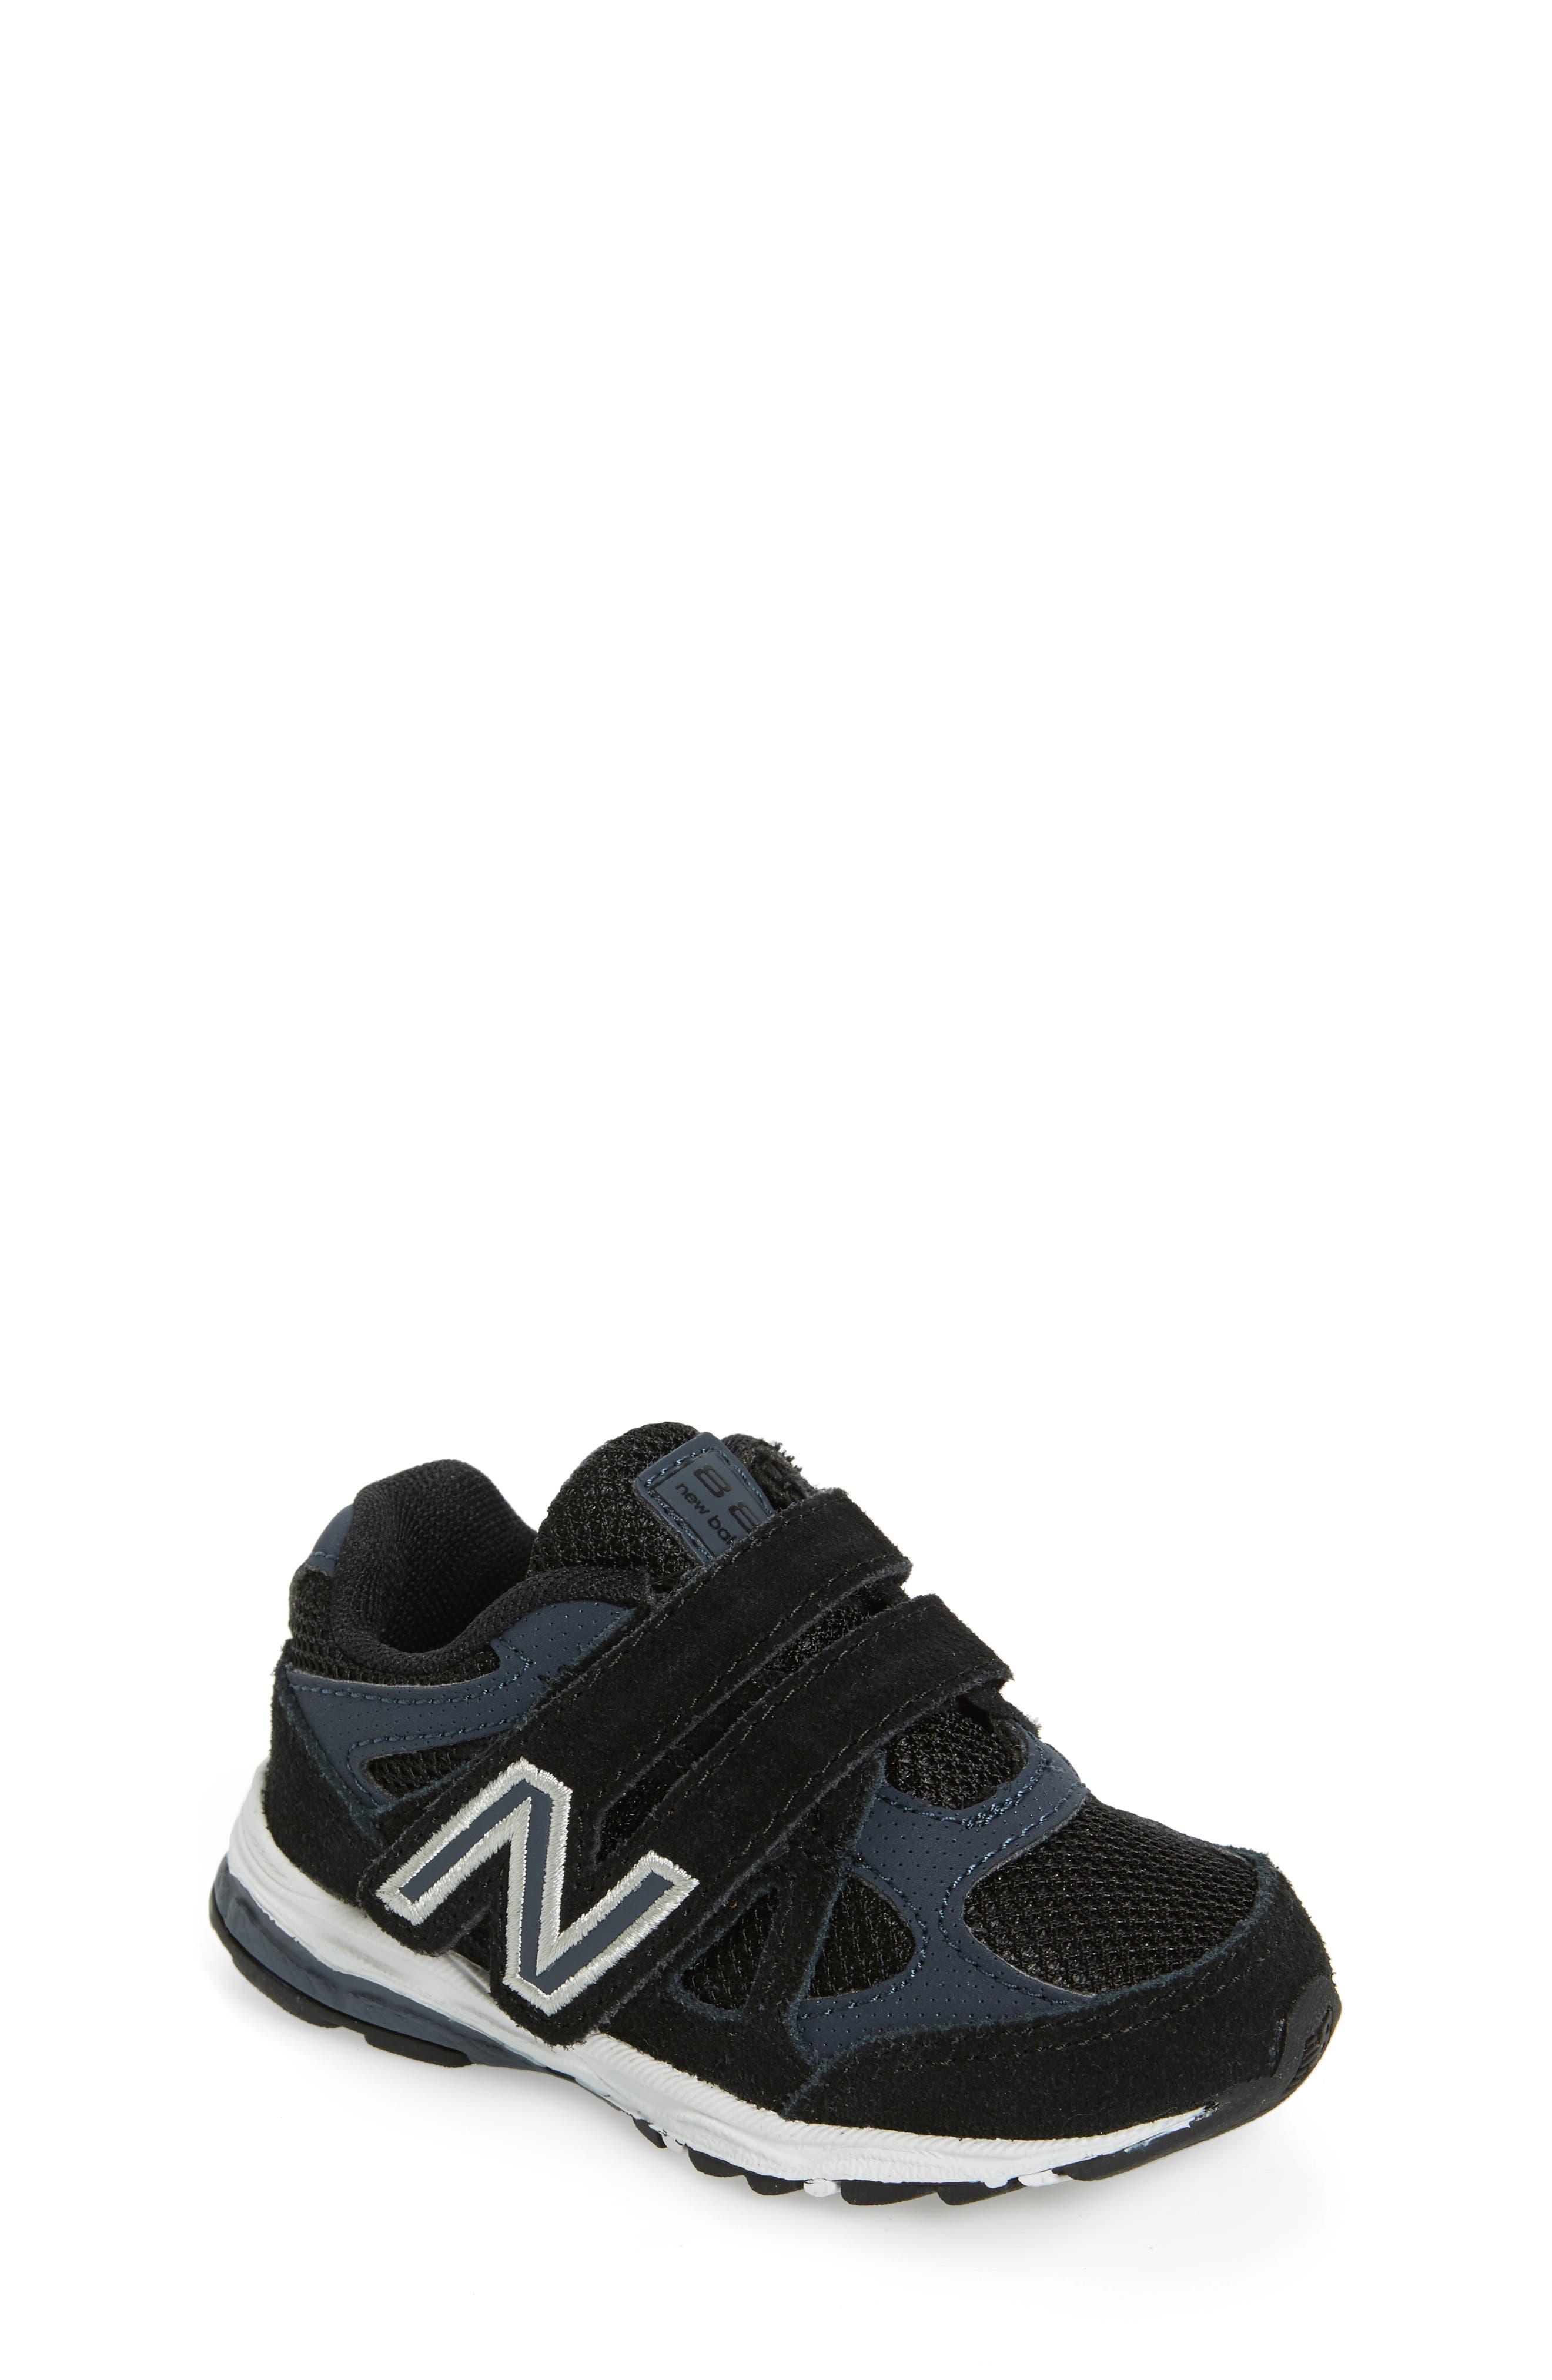 888 Sneaker,                             Main thumbnail 1, color,                             003